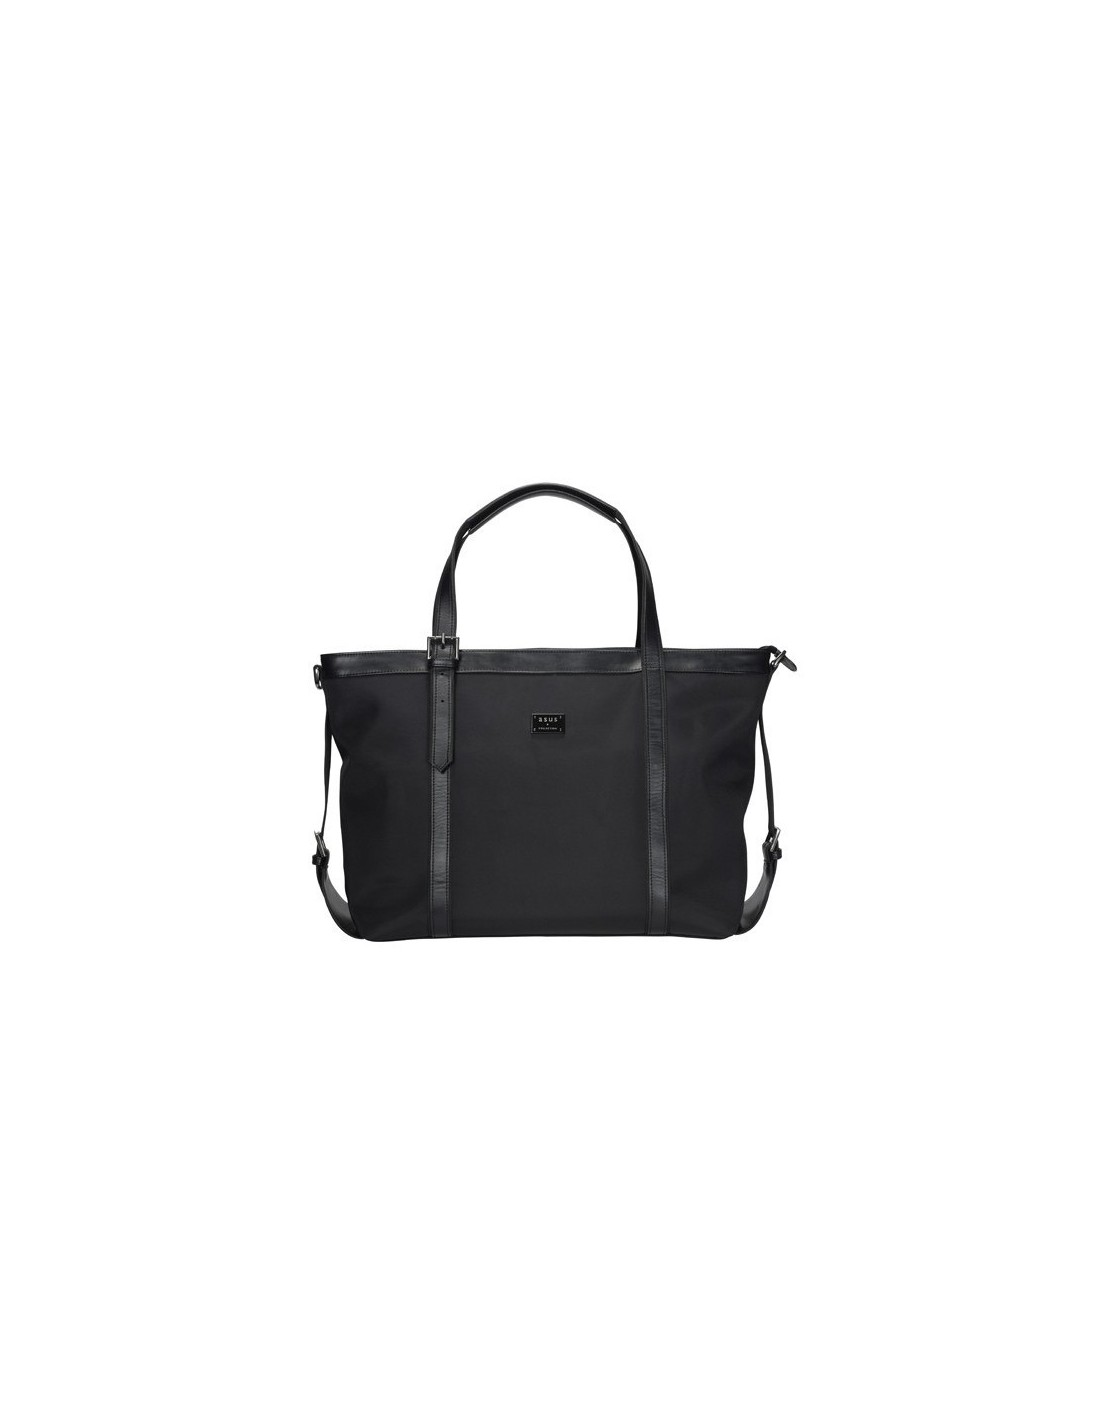 Asus METIS CARRY BAG 15 INCH BLACK (90-XB3U00BA00000) 4d3212e628